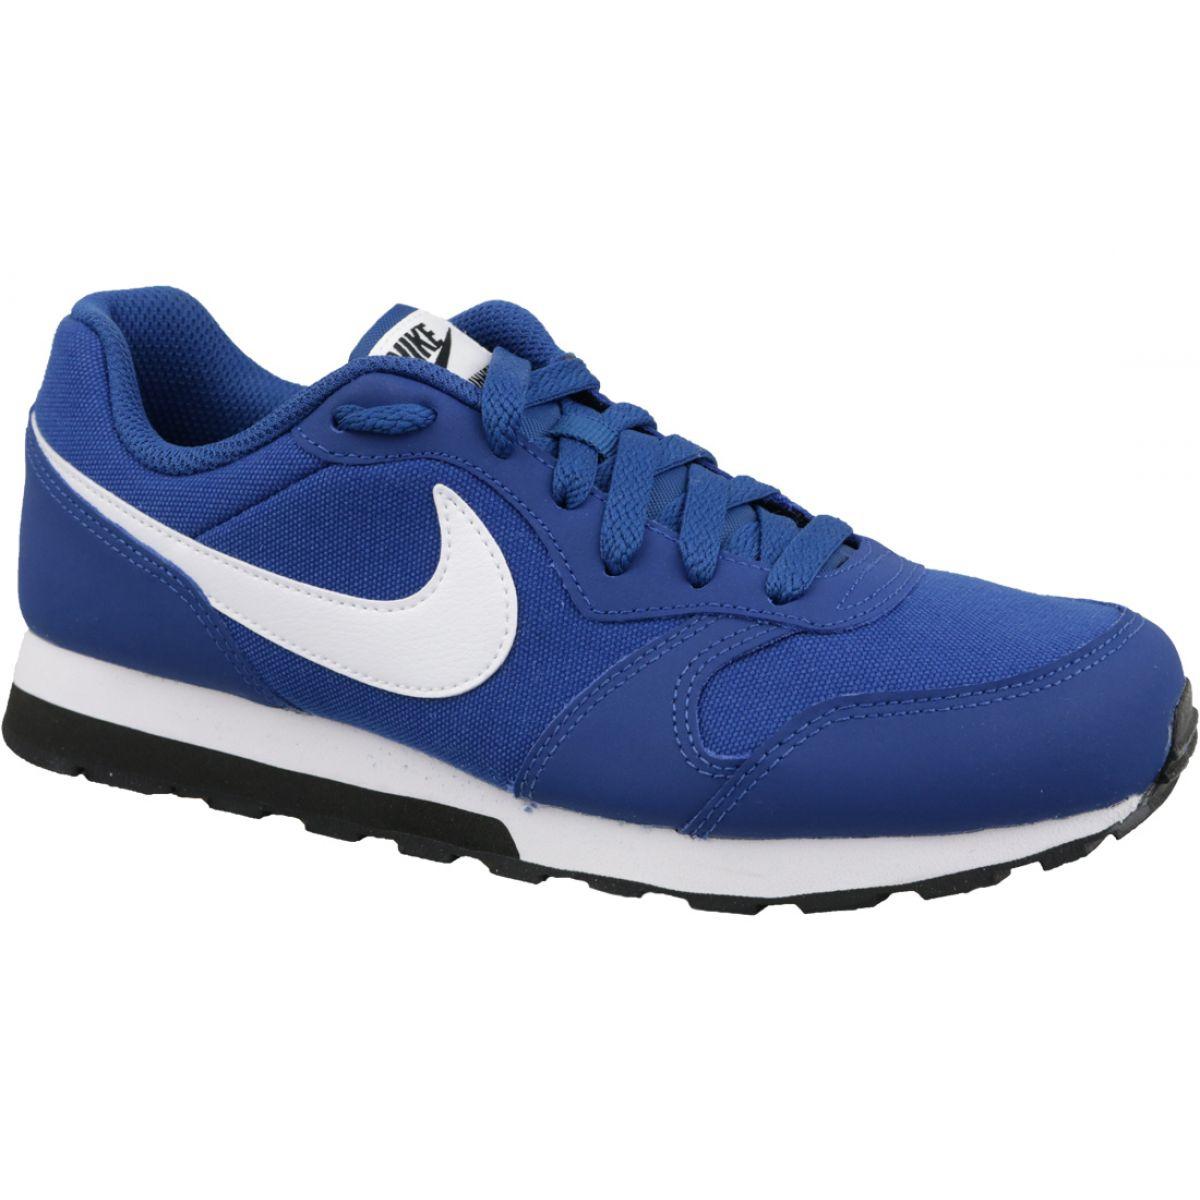 Nike Md Runner 2 Gs Jr 807316 411 Schuhe blau